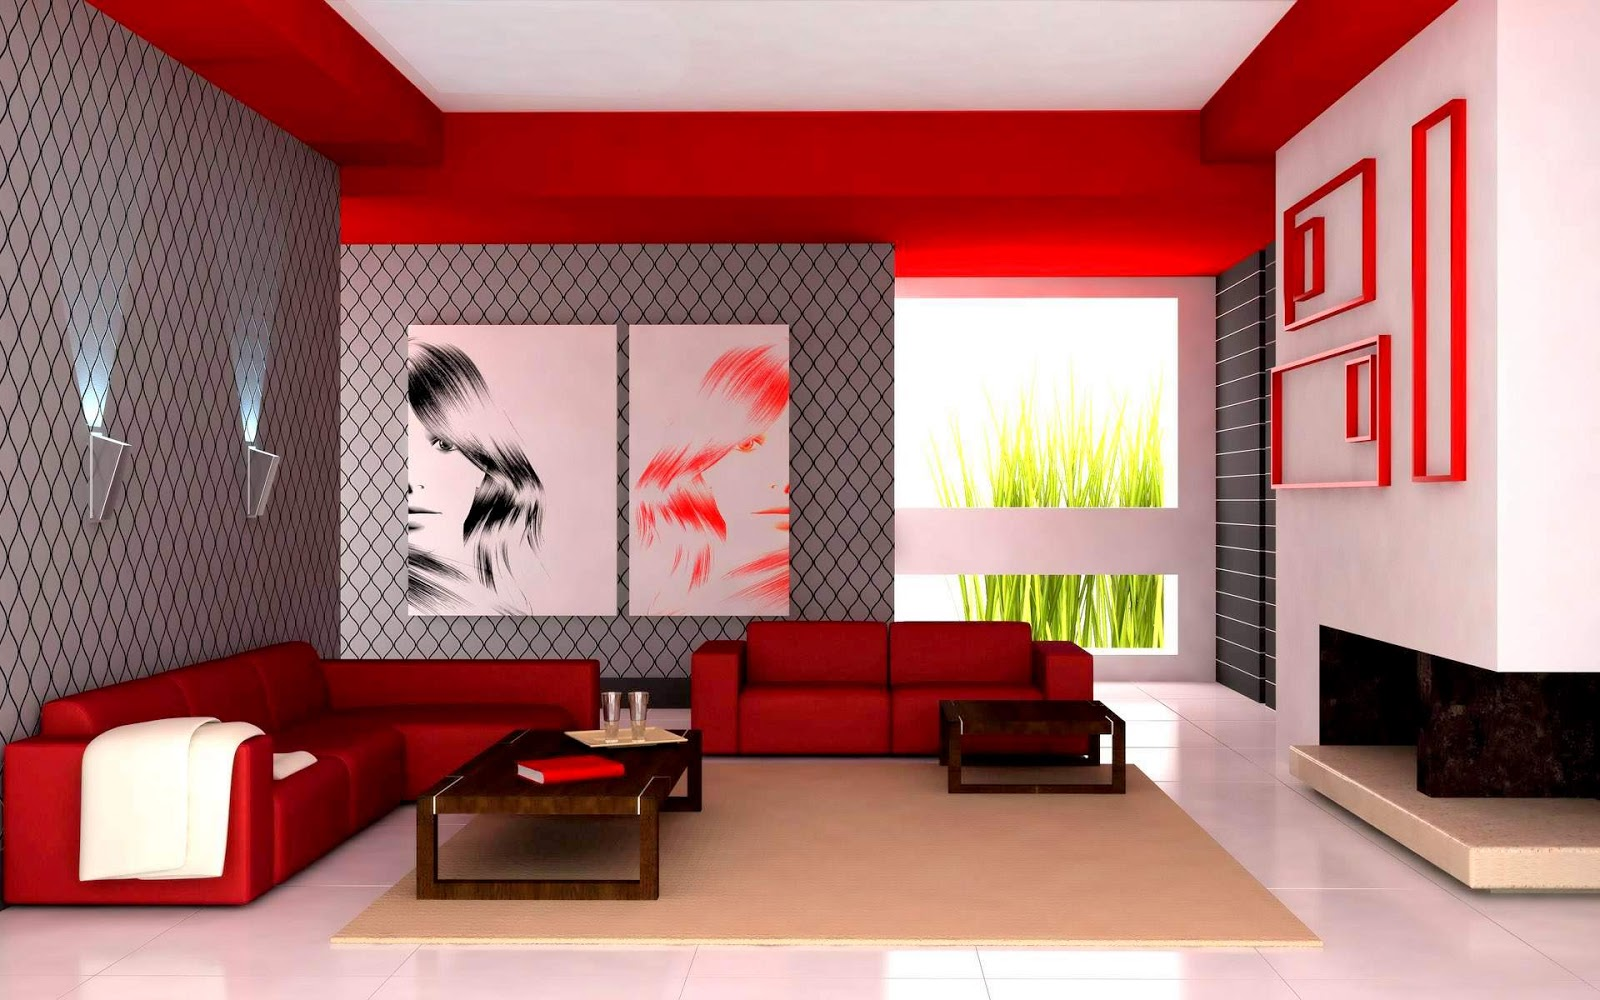 Kombinasi Warna Cat Ruang Tamu Klik Gambar Untuk Memeperjelas